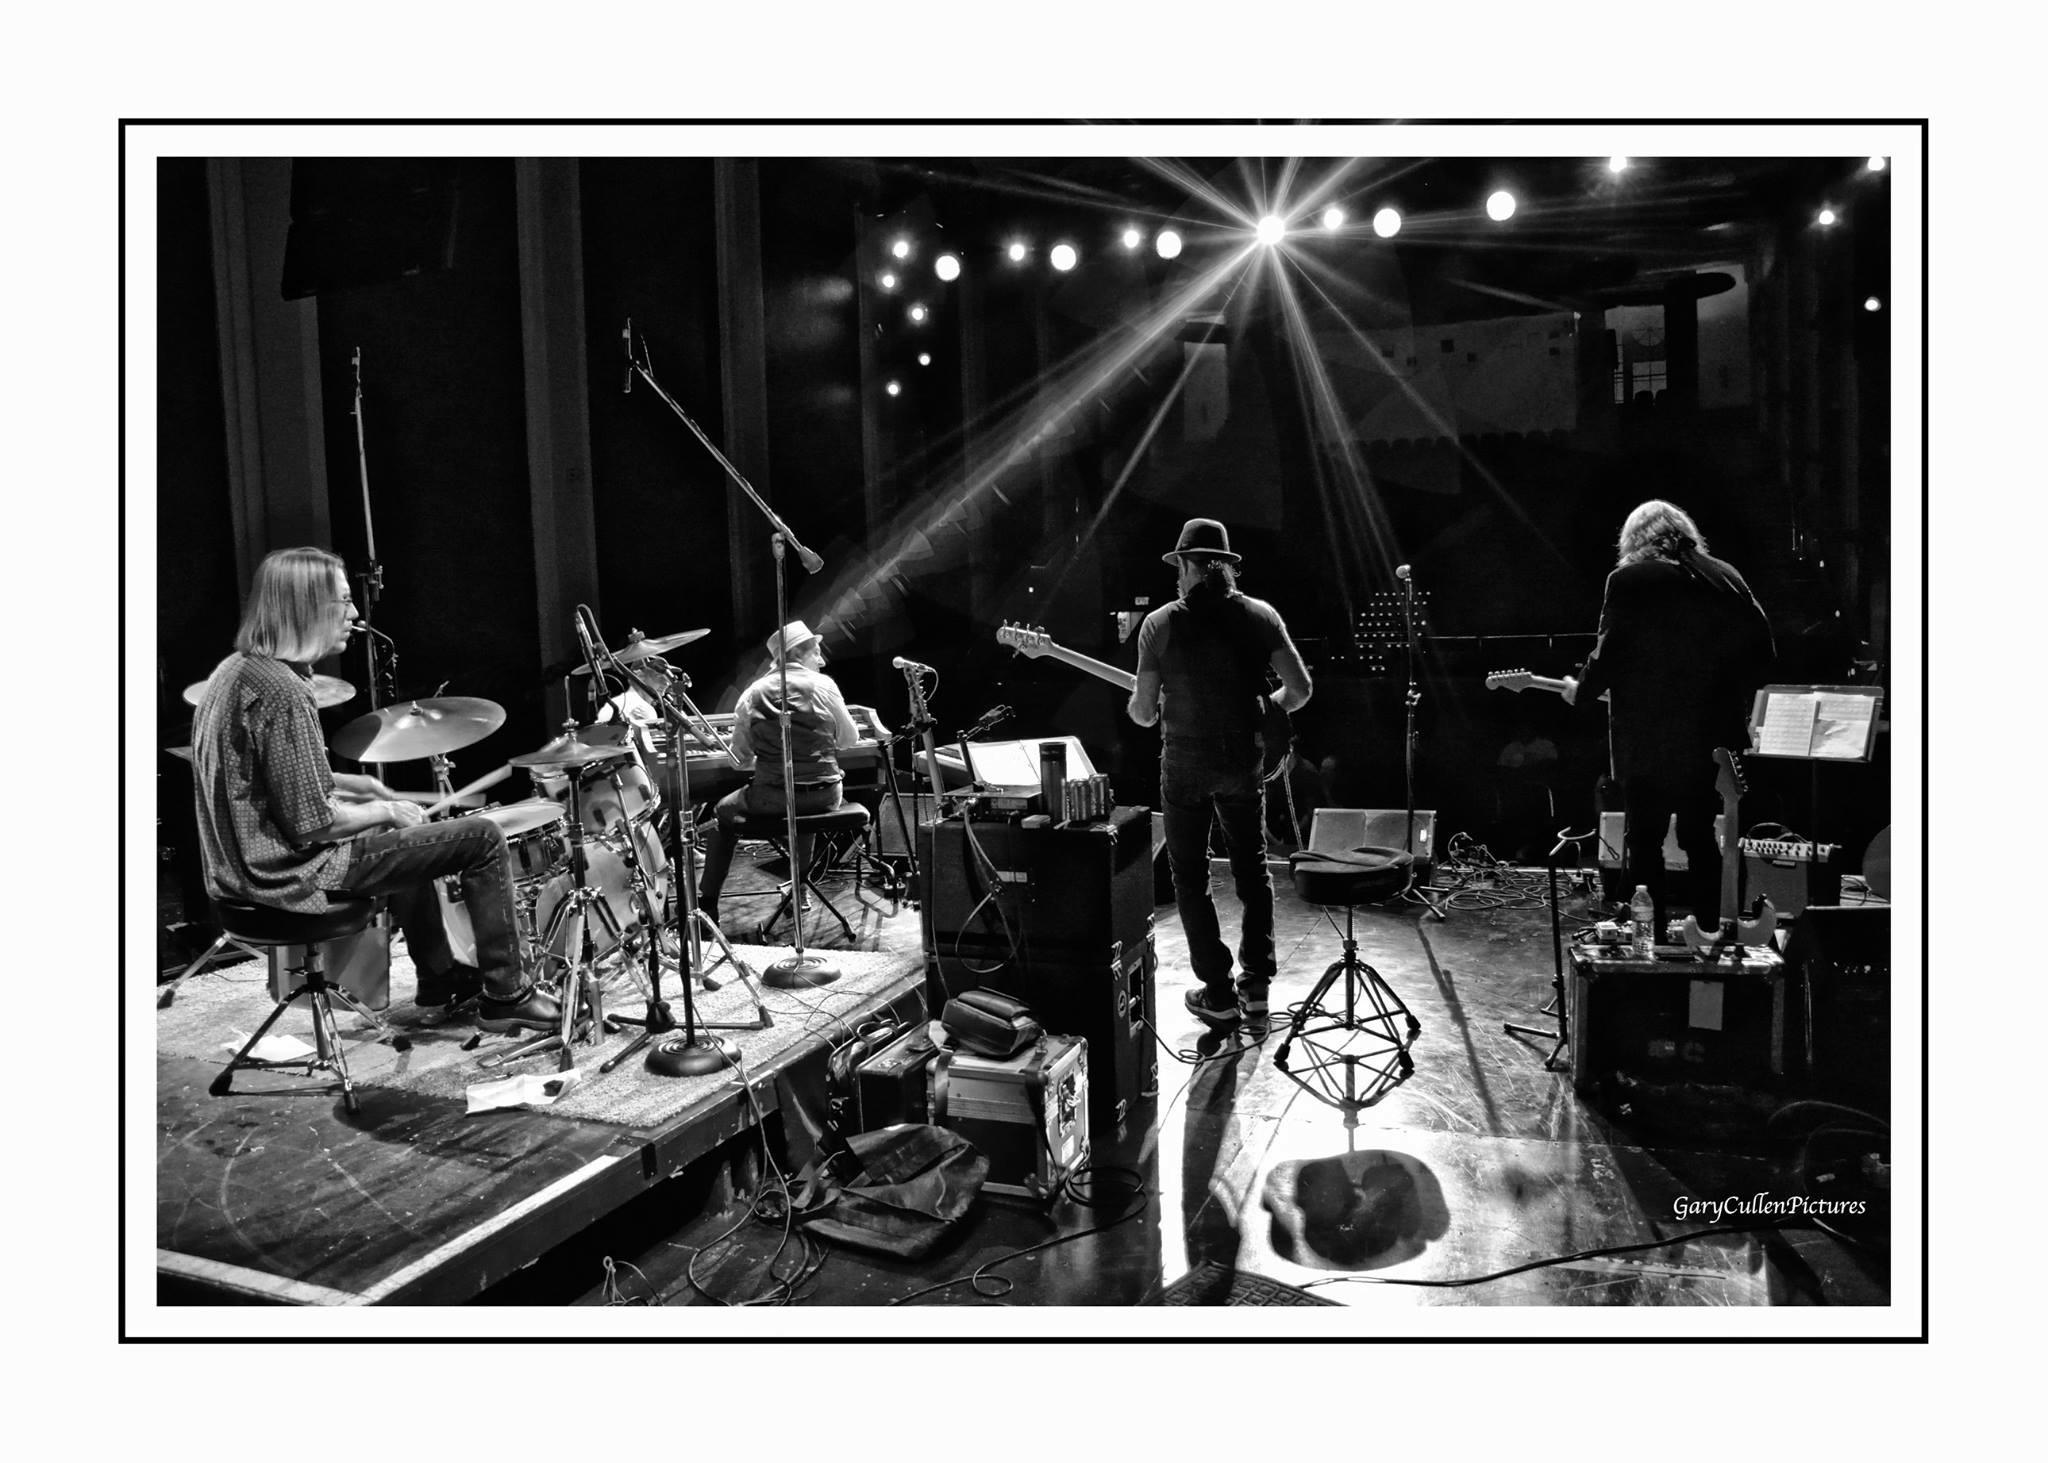 The Eamonn Flynn Band at Lucca